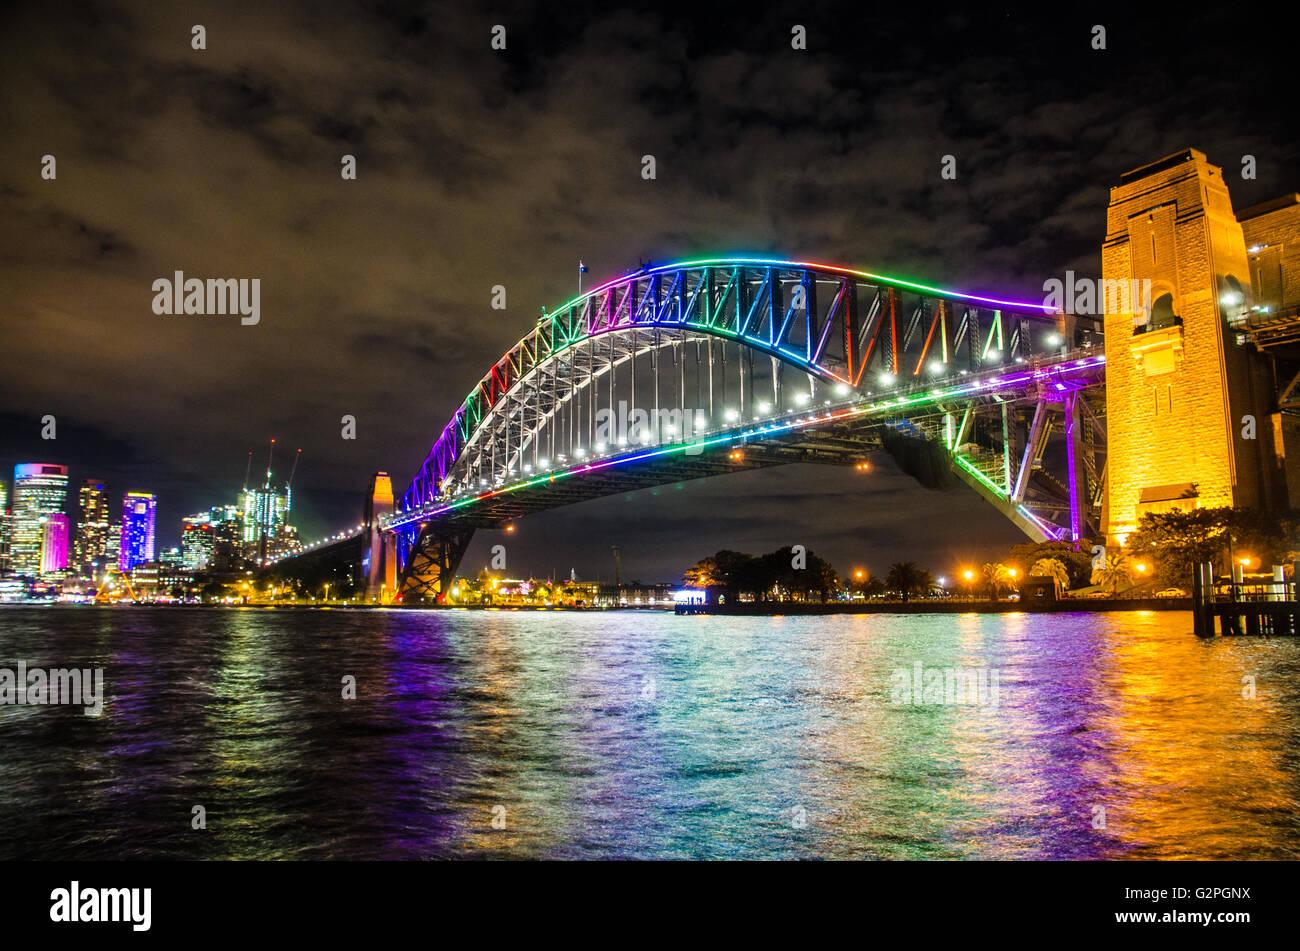 Free online sex shows in Sydney